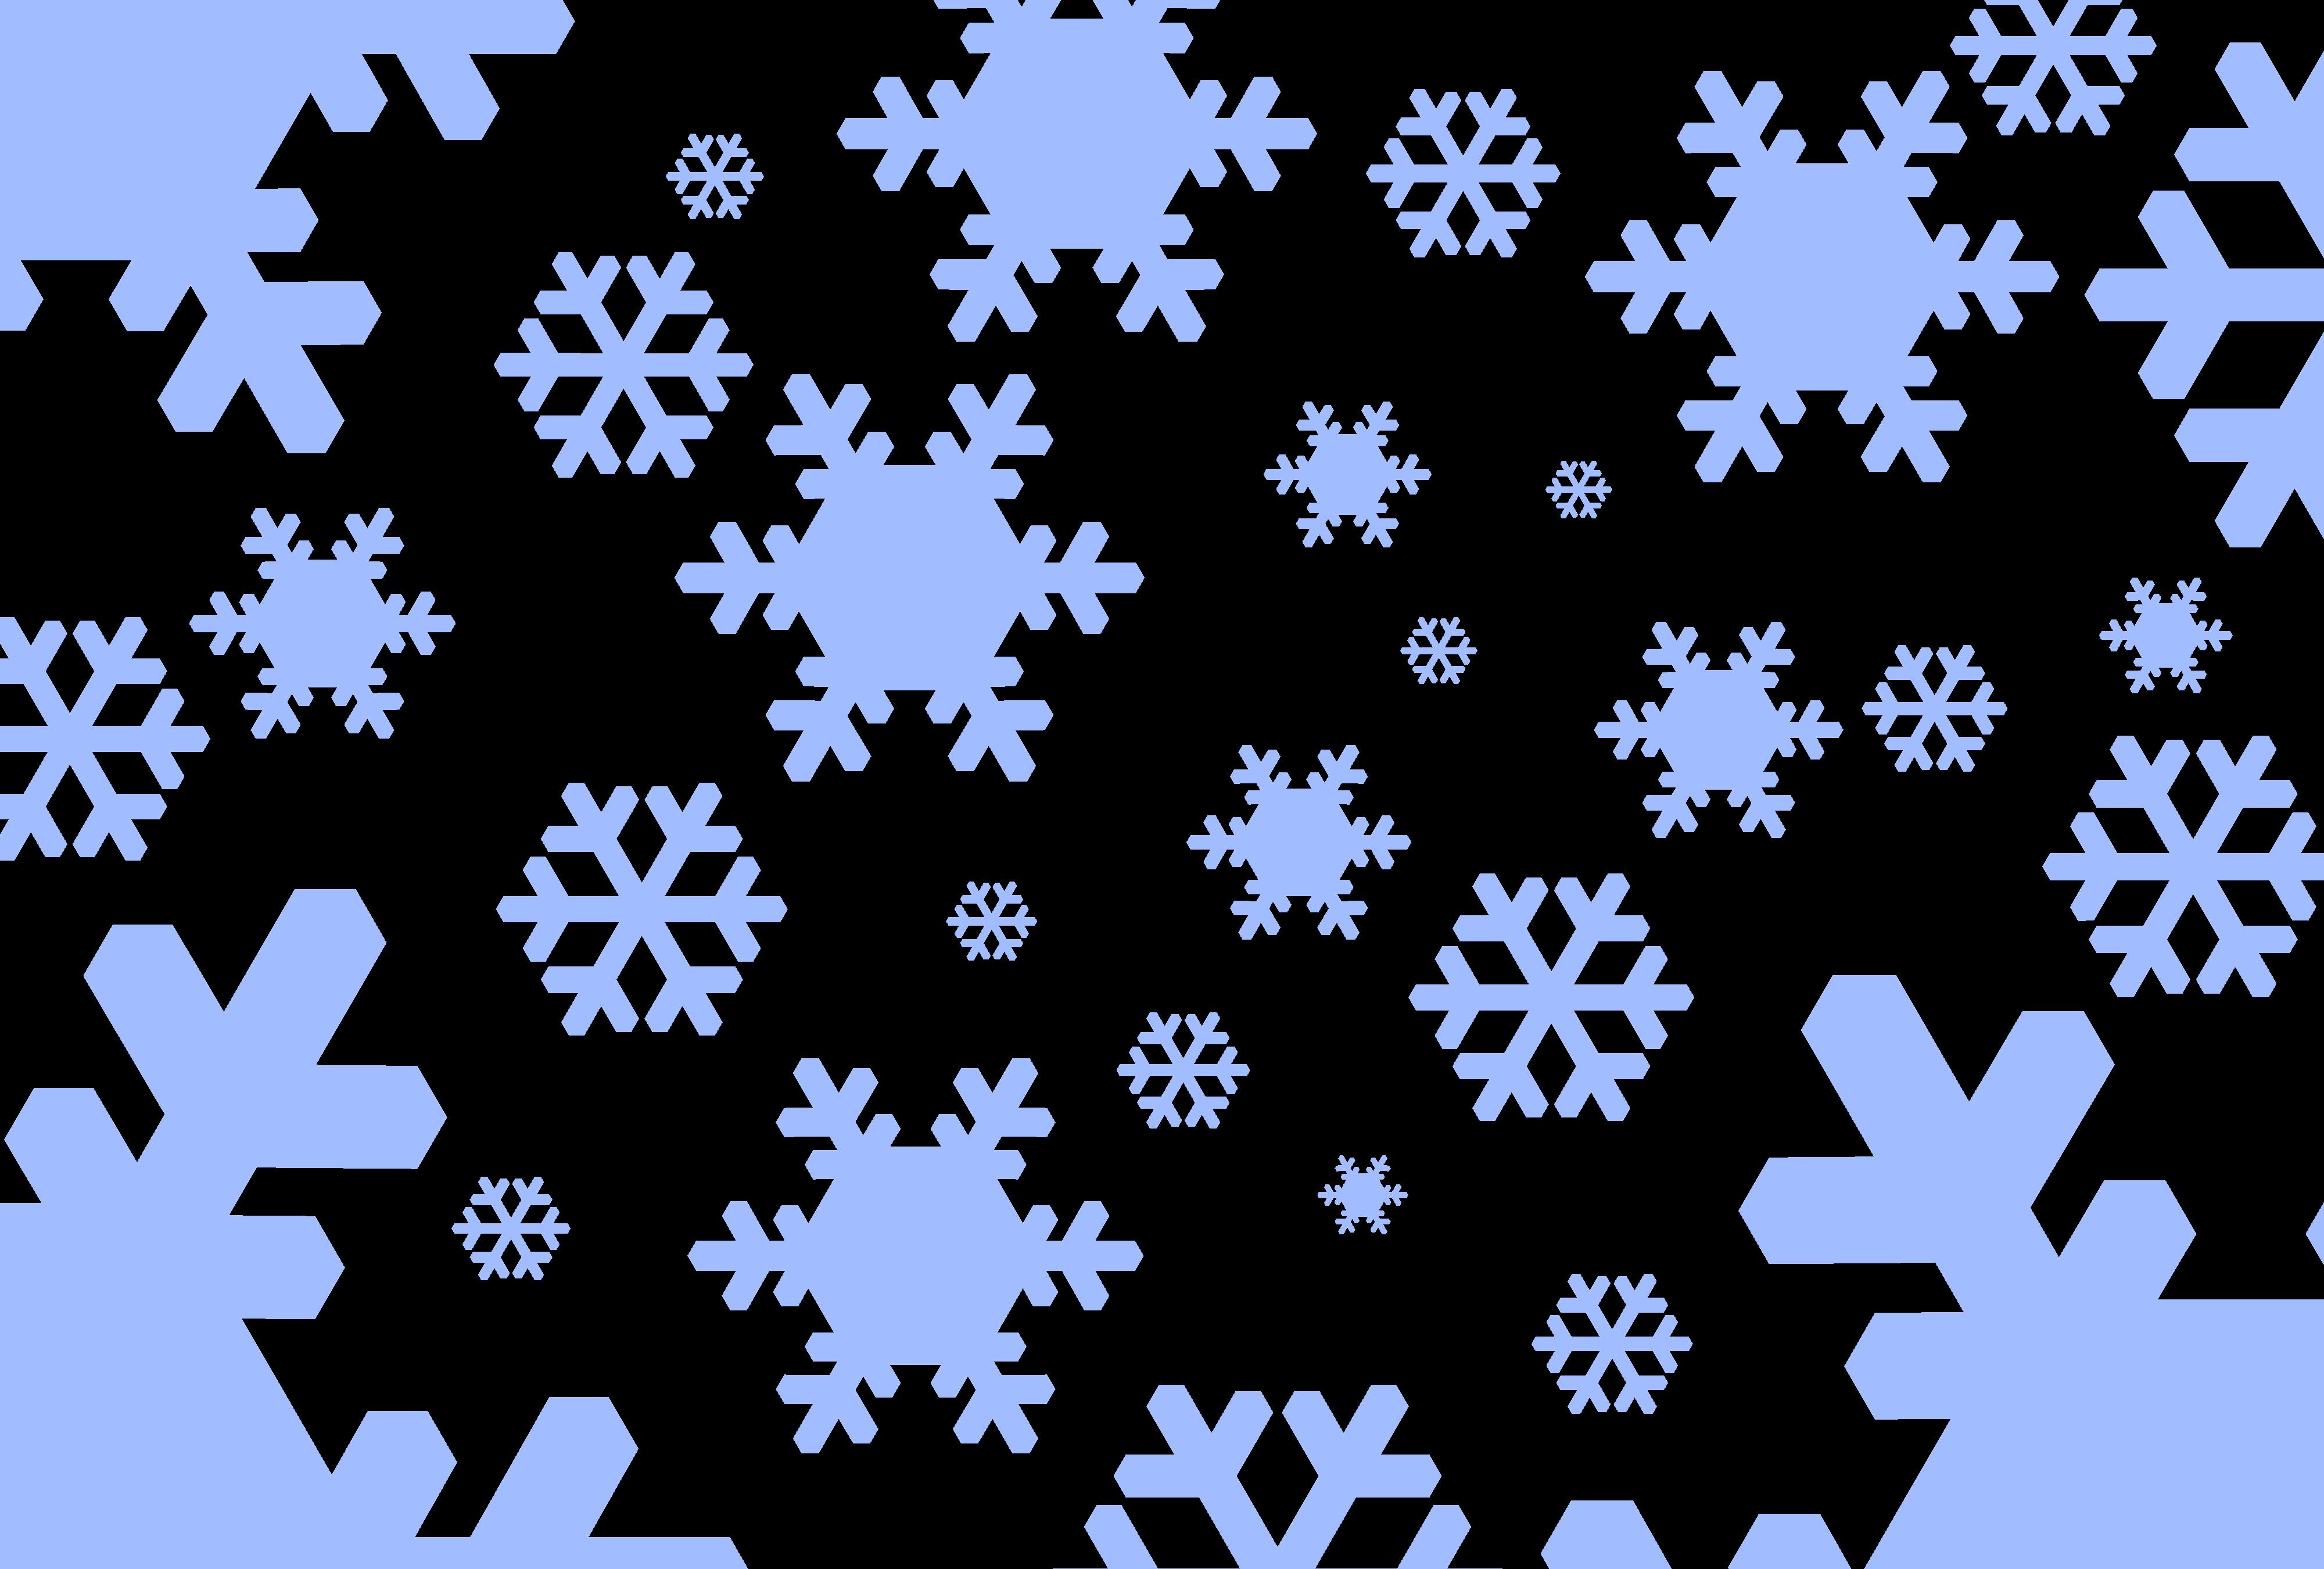 Free Stock Photo 1535 Graphic Snowflakes Black